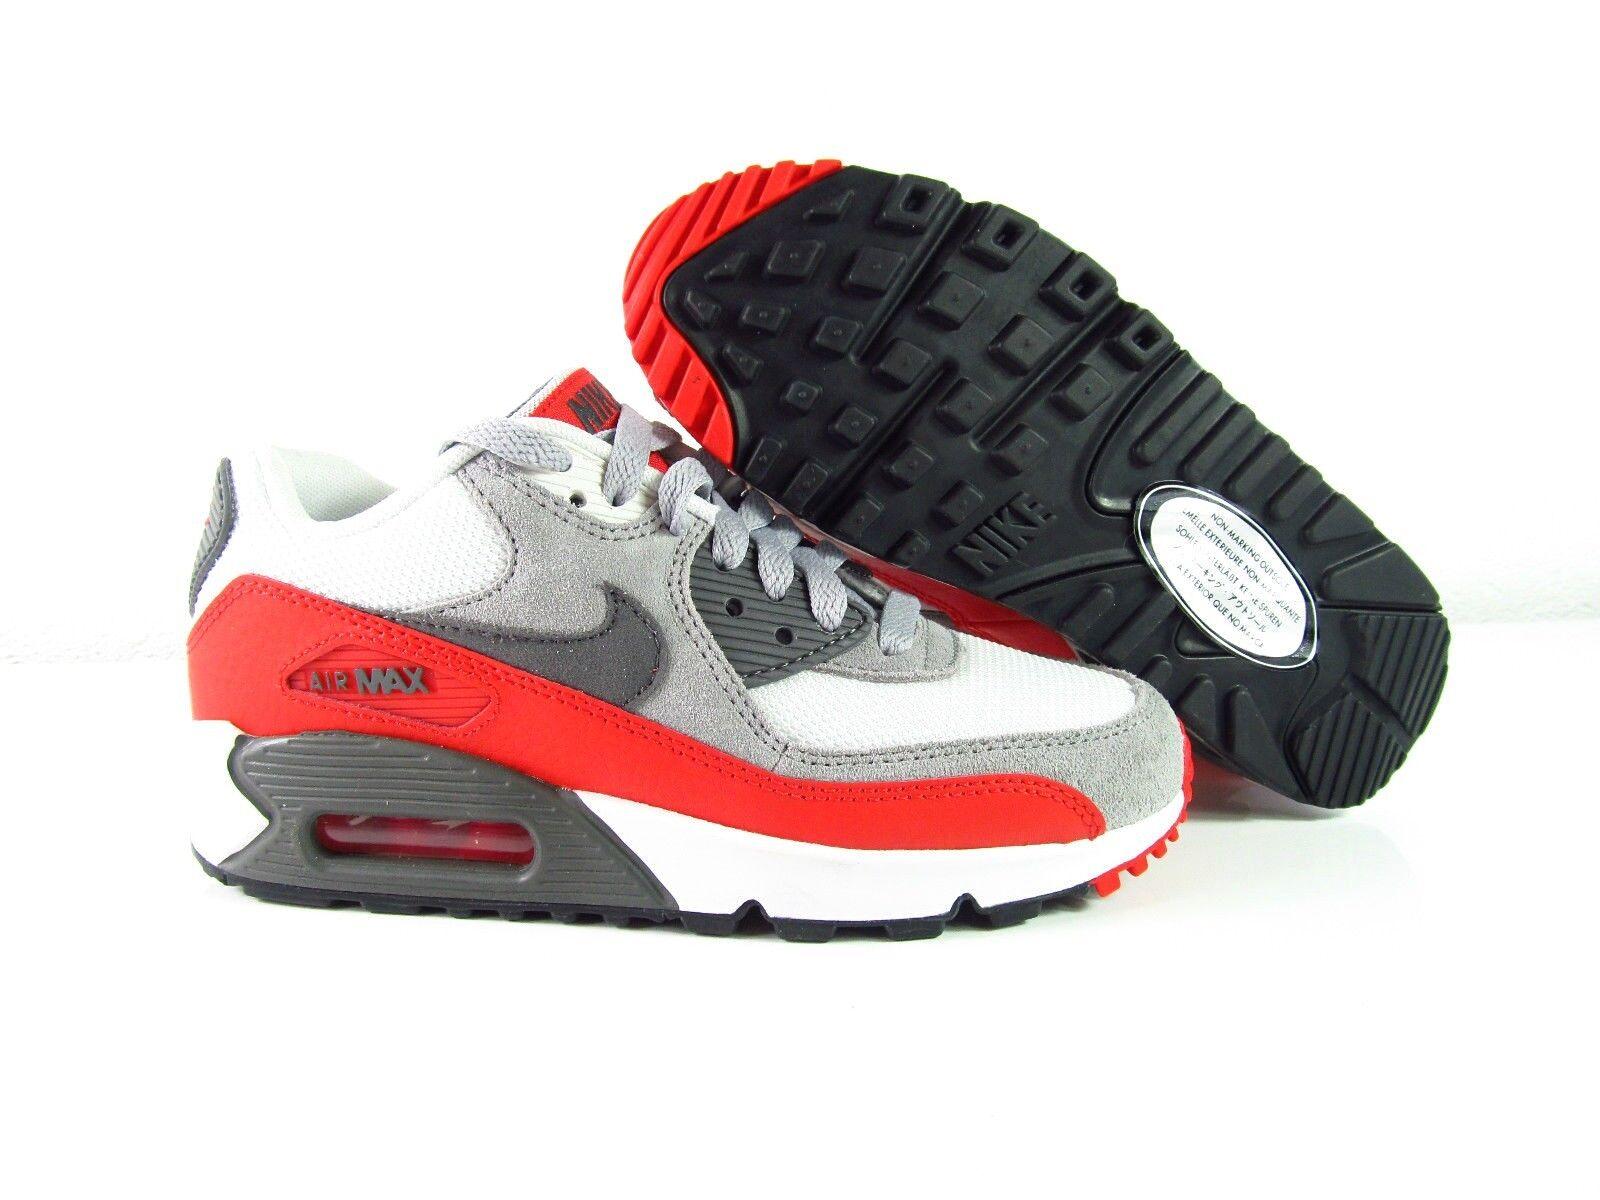 Nike Air Max 90 GS Classic Retro Schwarz Rot Weiss1 87 Sneaker Schuhe